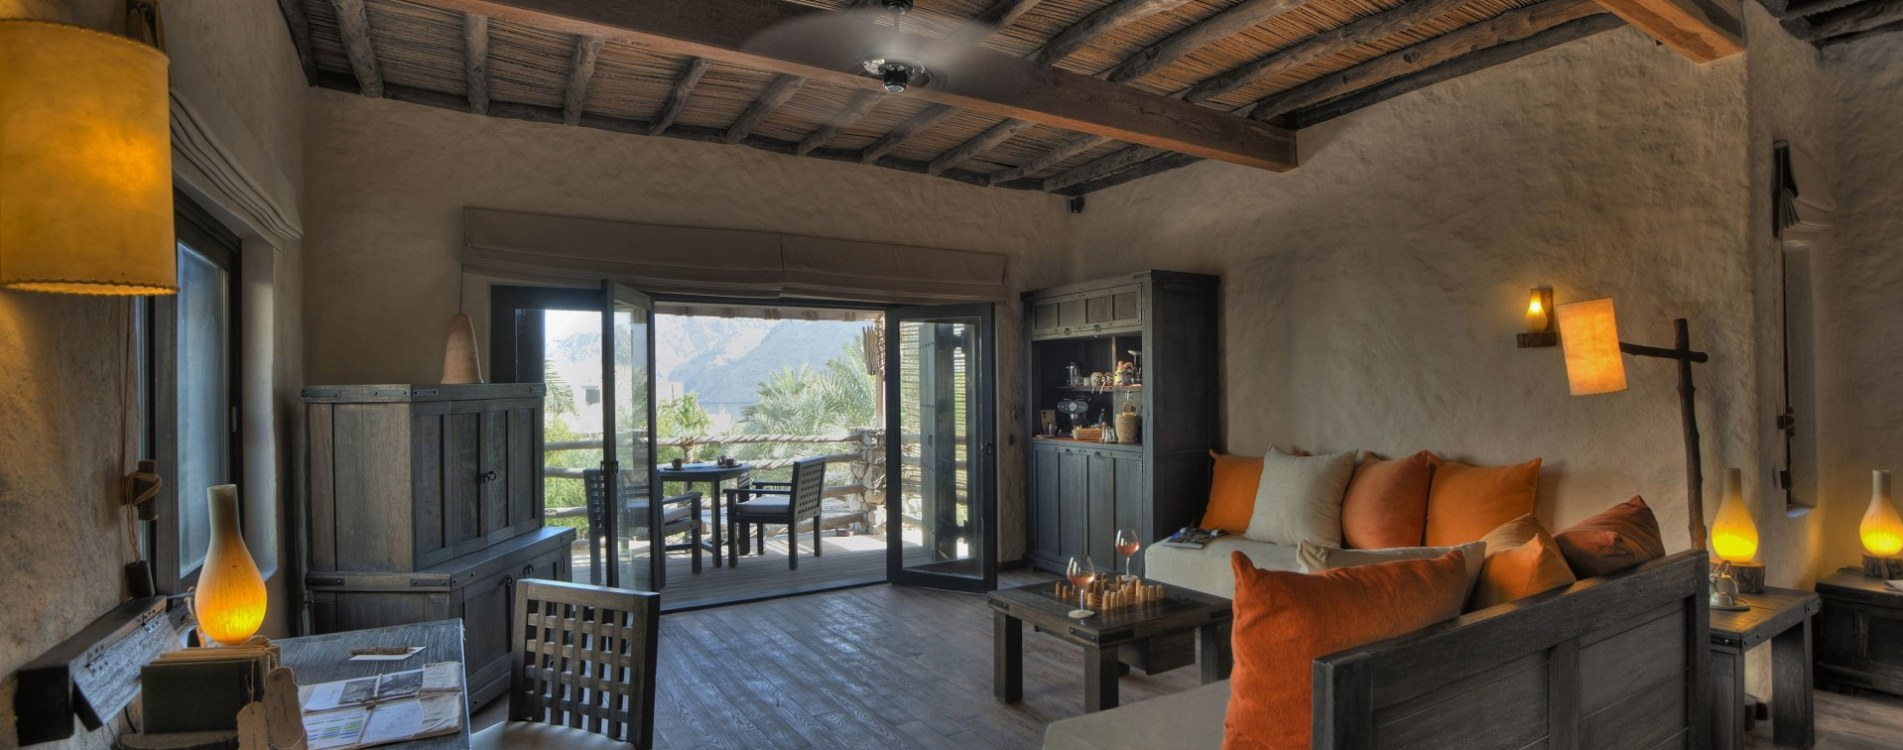 Six-Senses-Zighy-Bay-Duplex-2-bedroom-Pool-Villa-Interior-Schlafzimmer-OMan.jpg